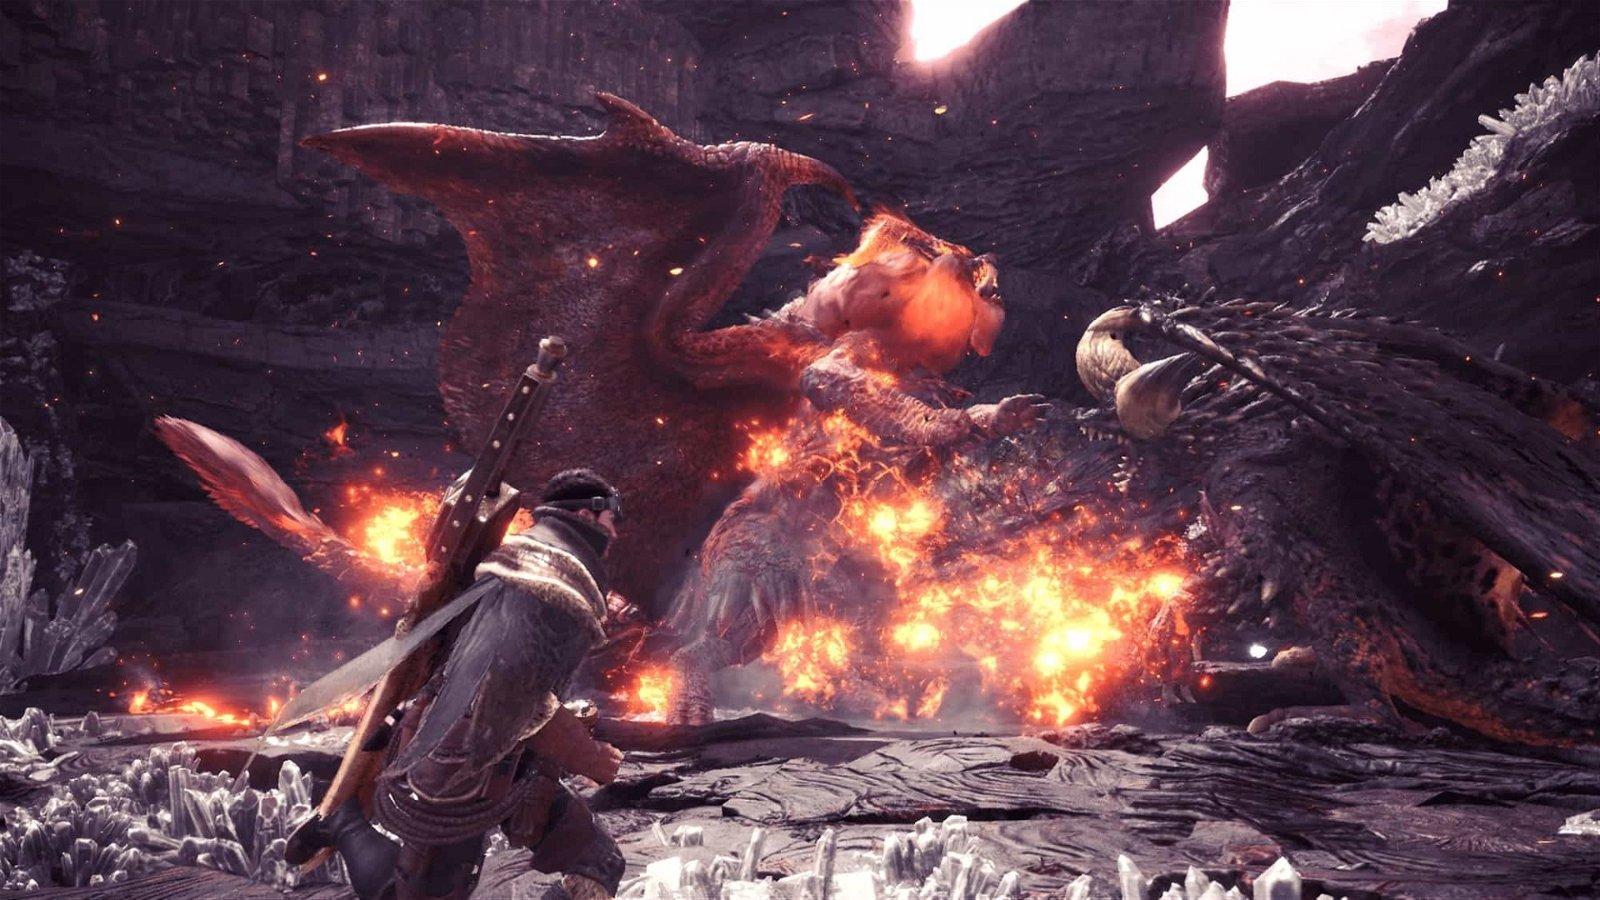 New Monster Hunter: World Trailer Introduces Elder Dragons